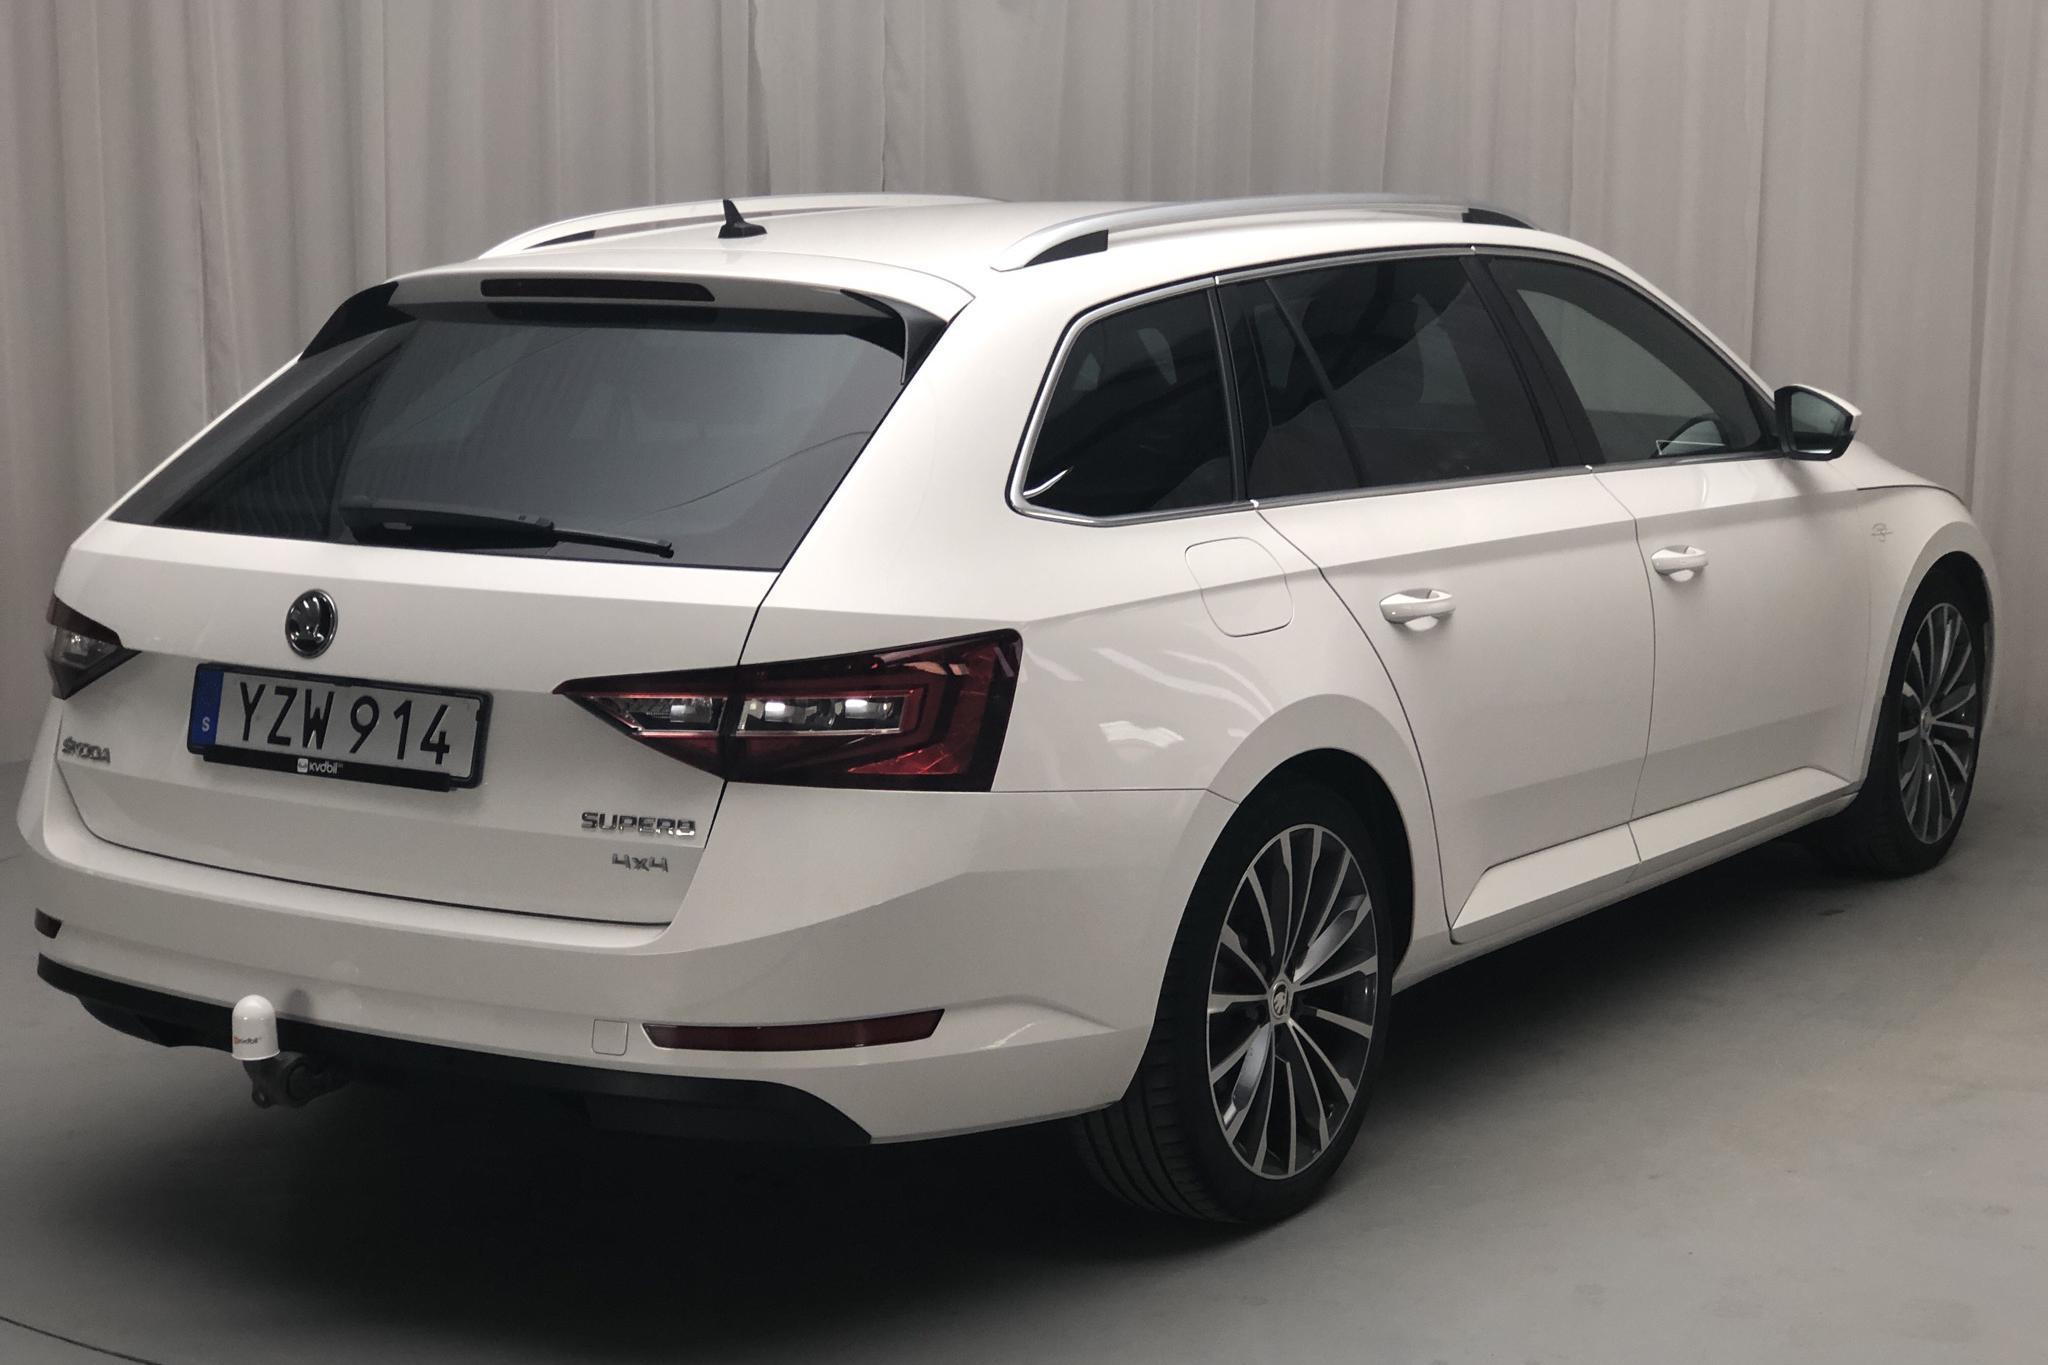 Skoda Superb 2.0 TDI 4x4 Kombi (190hk) - 154 120 km - Automatic - white - 2018